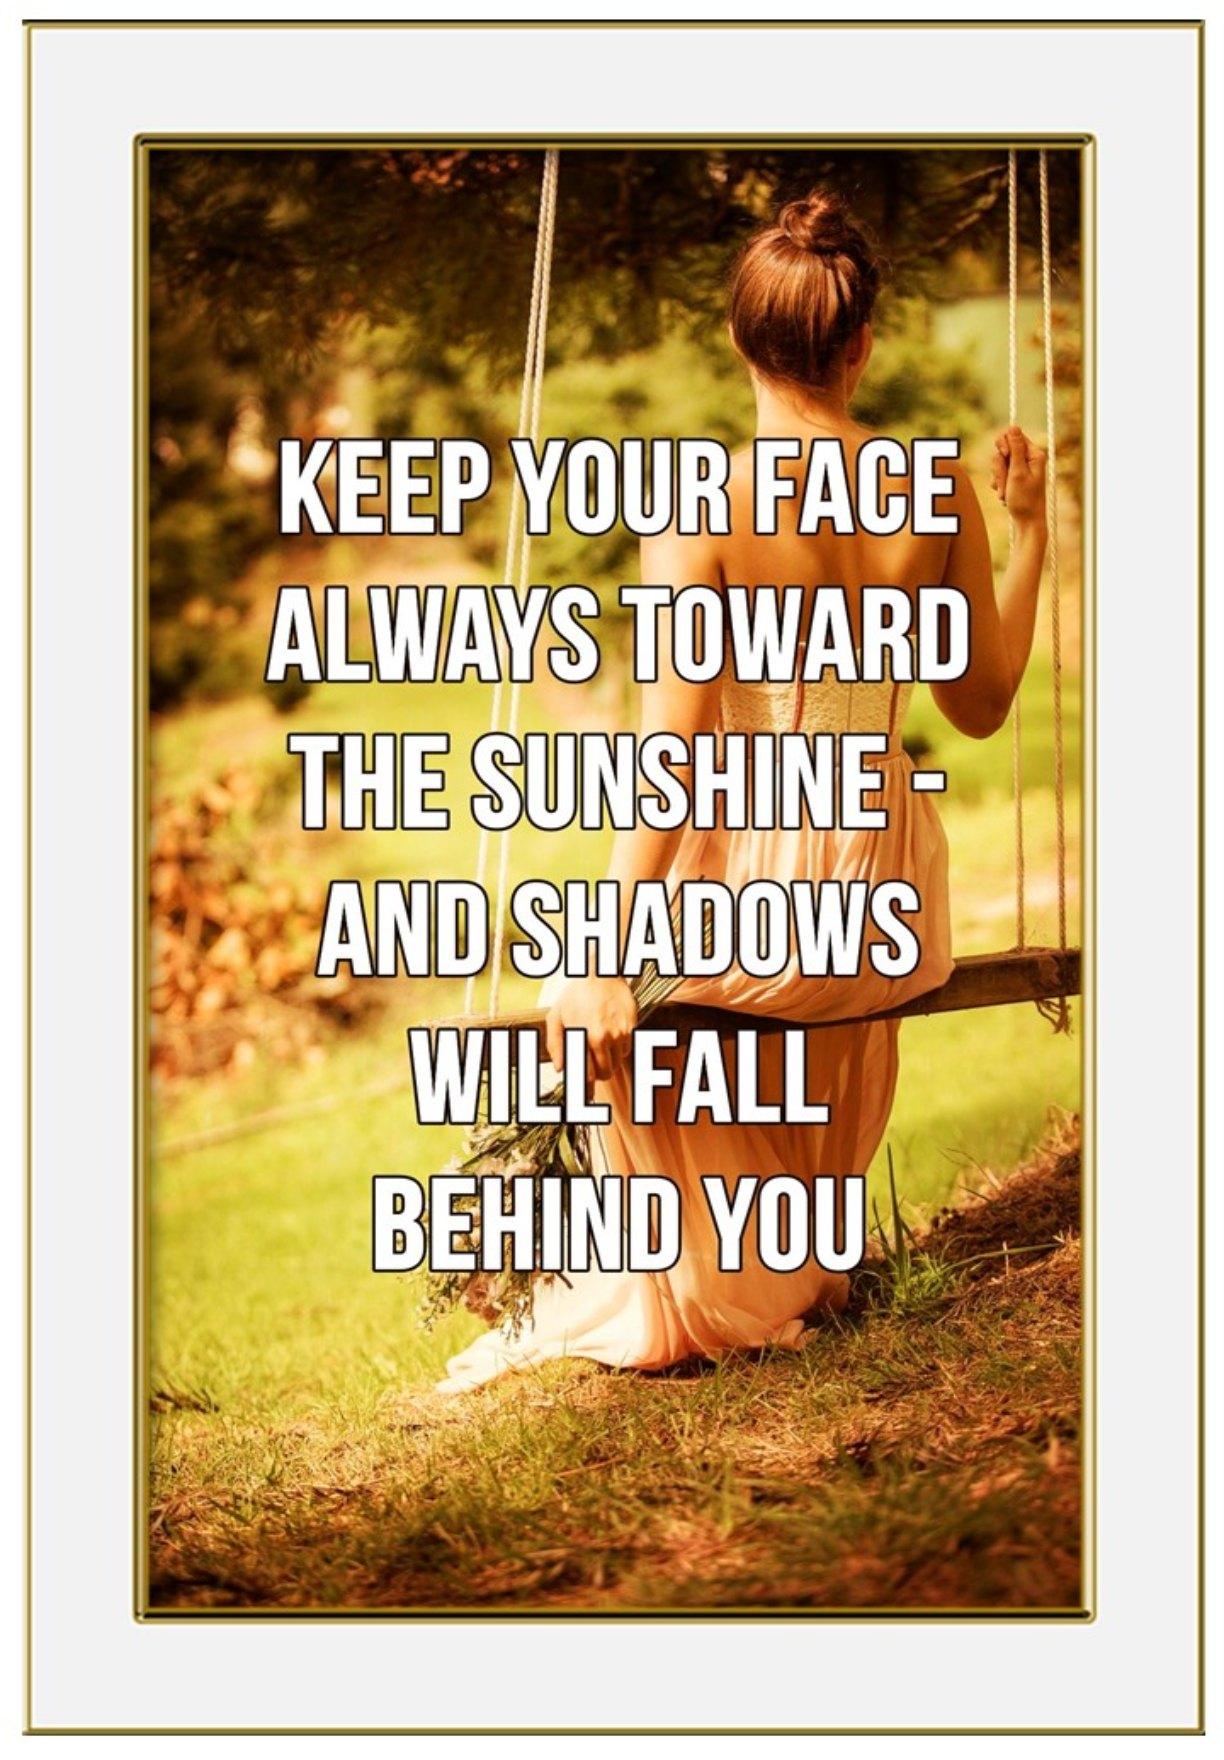 Walt Whitman quote keeo your face toward the sunshine bekitschig.blog